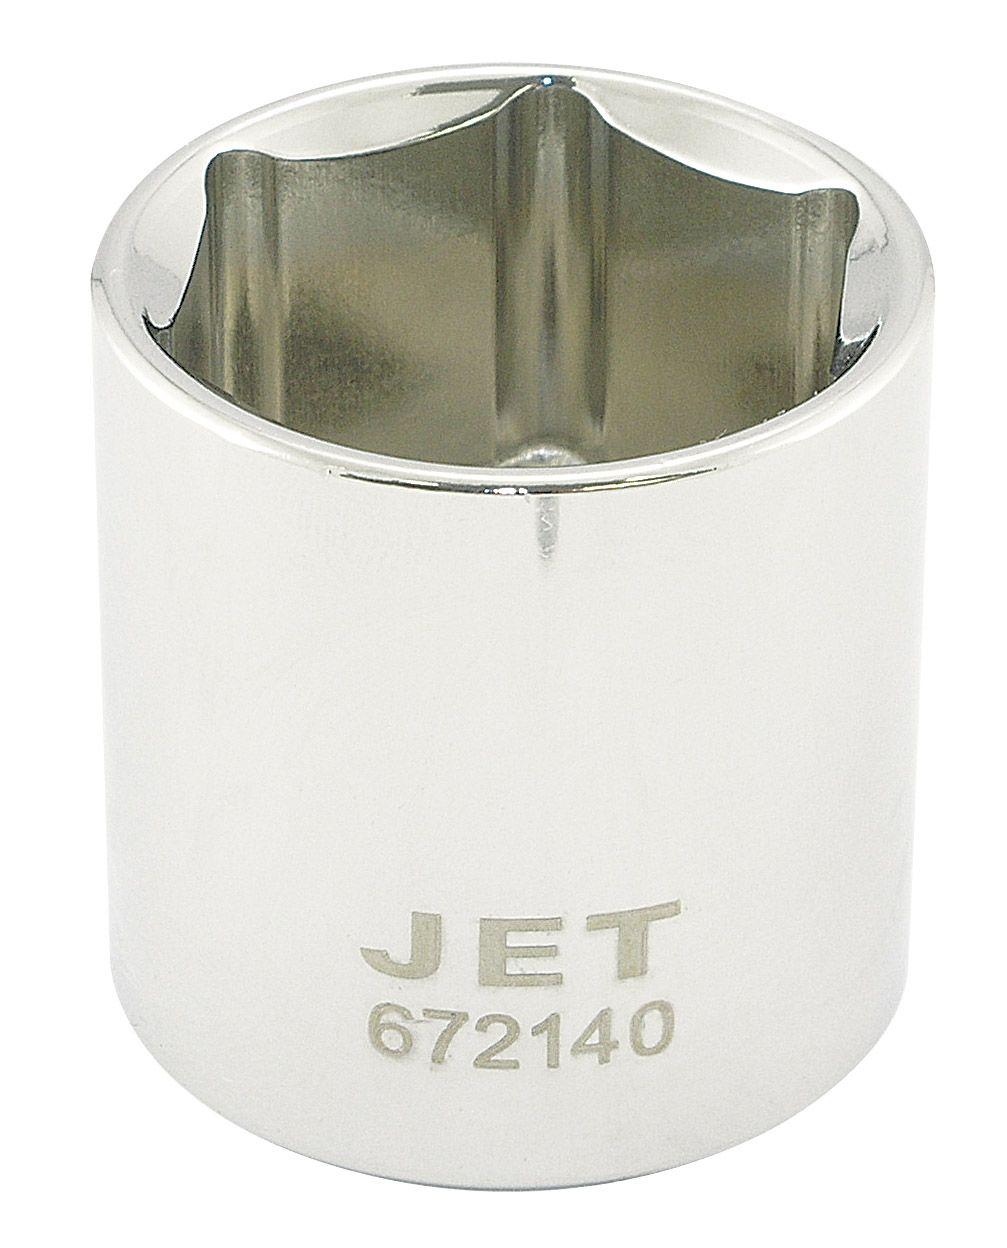 Jet 672134 Douille 1 1/16